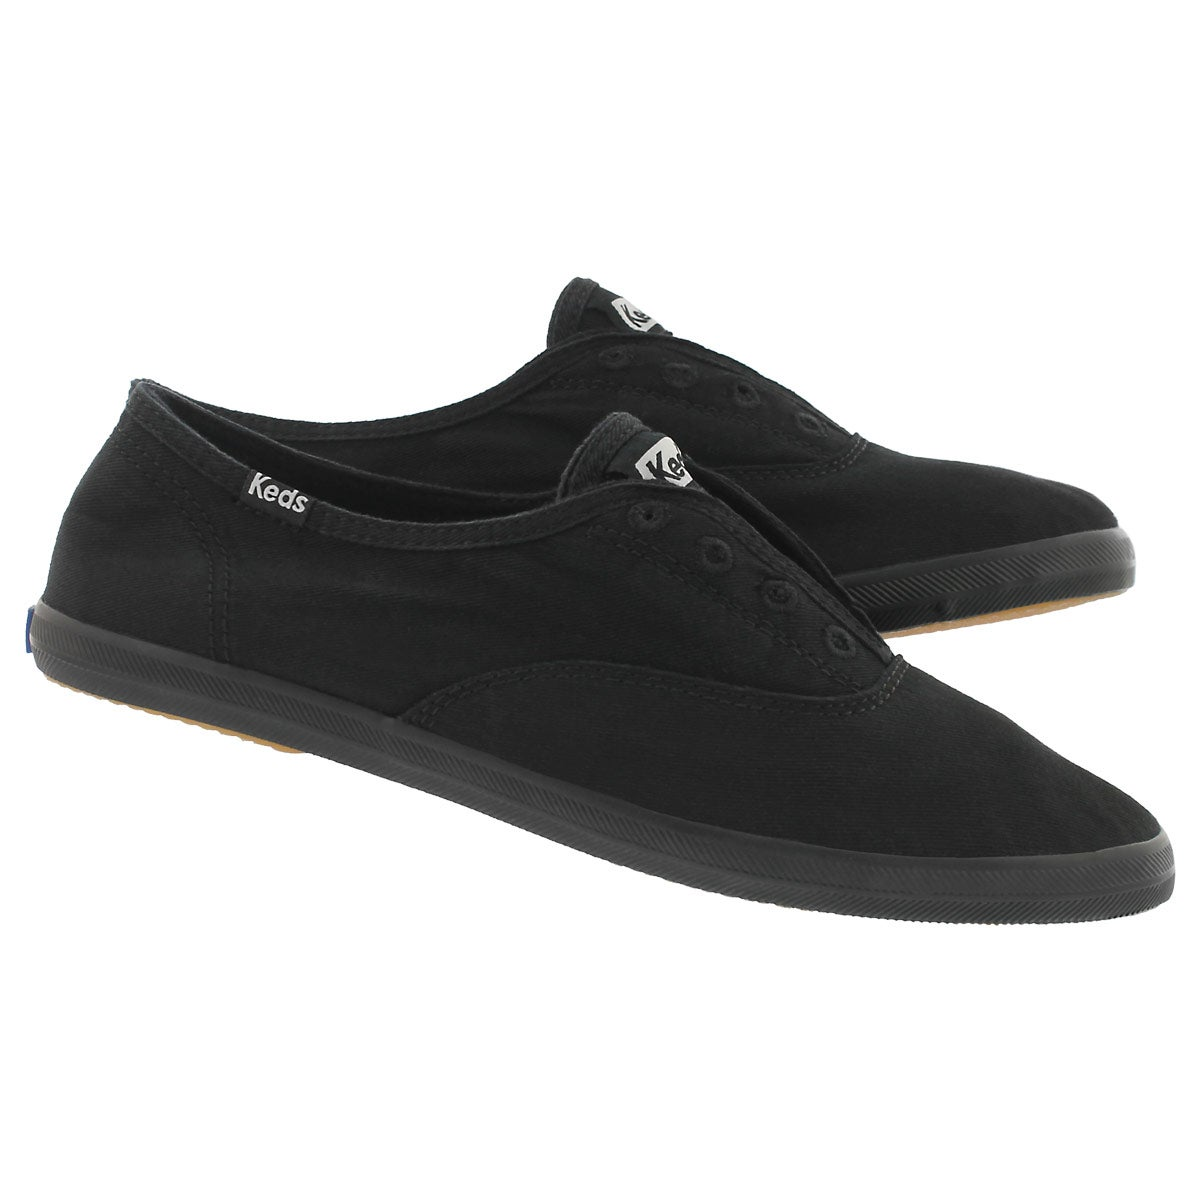 Lds Chillax black/black fashion sneaker